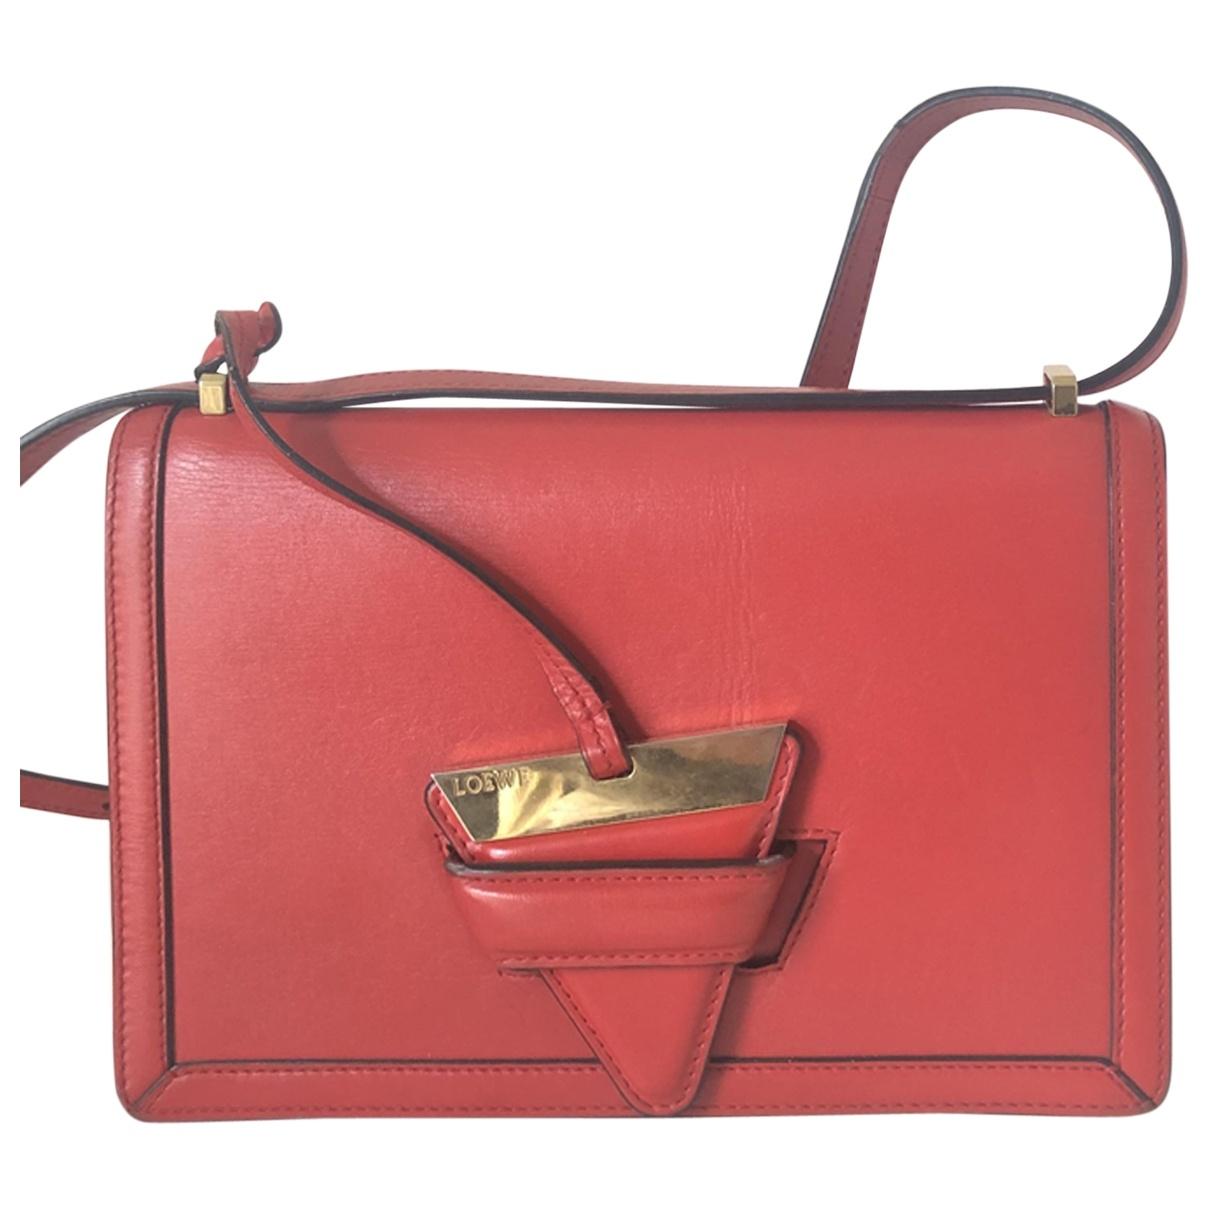 Loewe - Sac a main Barcelona pour femme en cuir - rouge